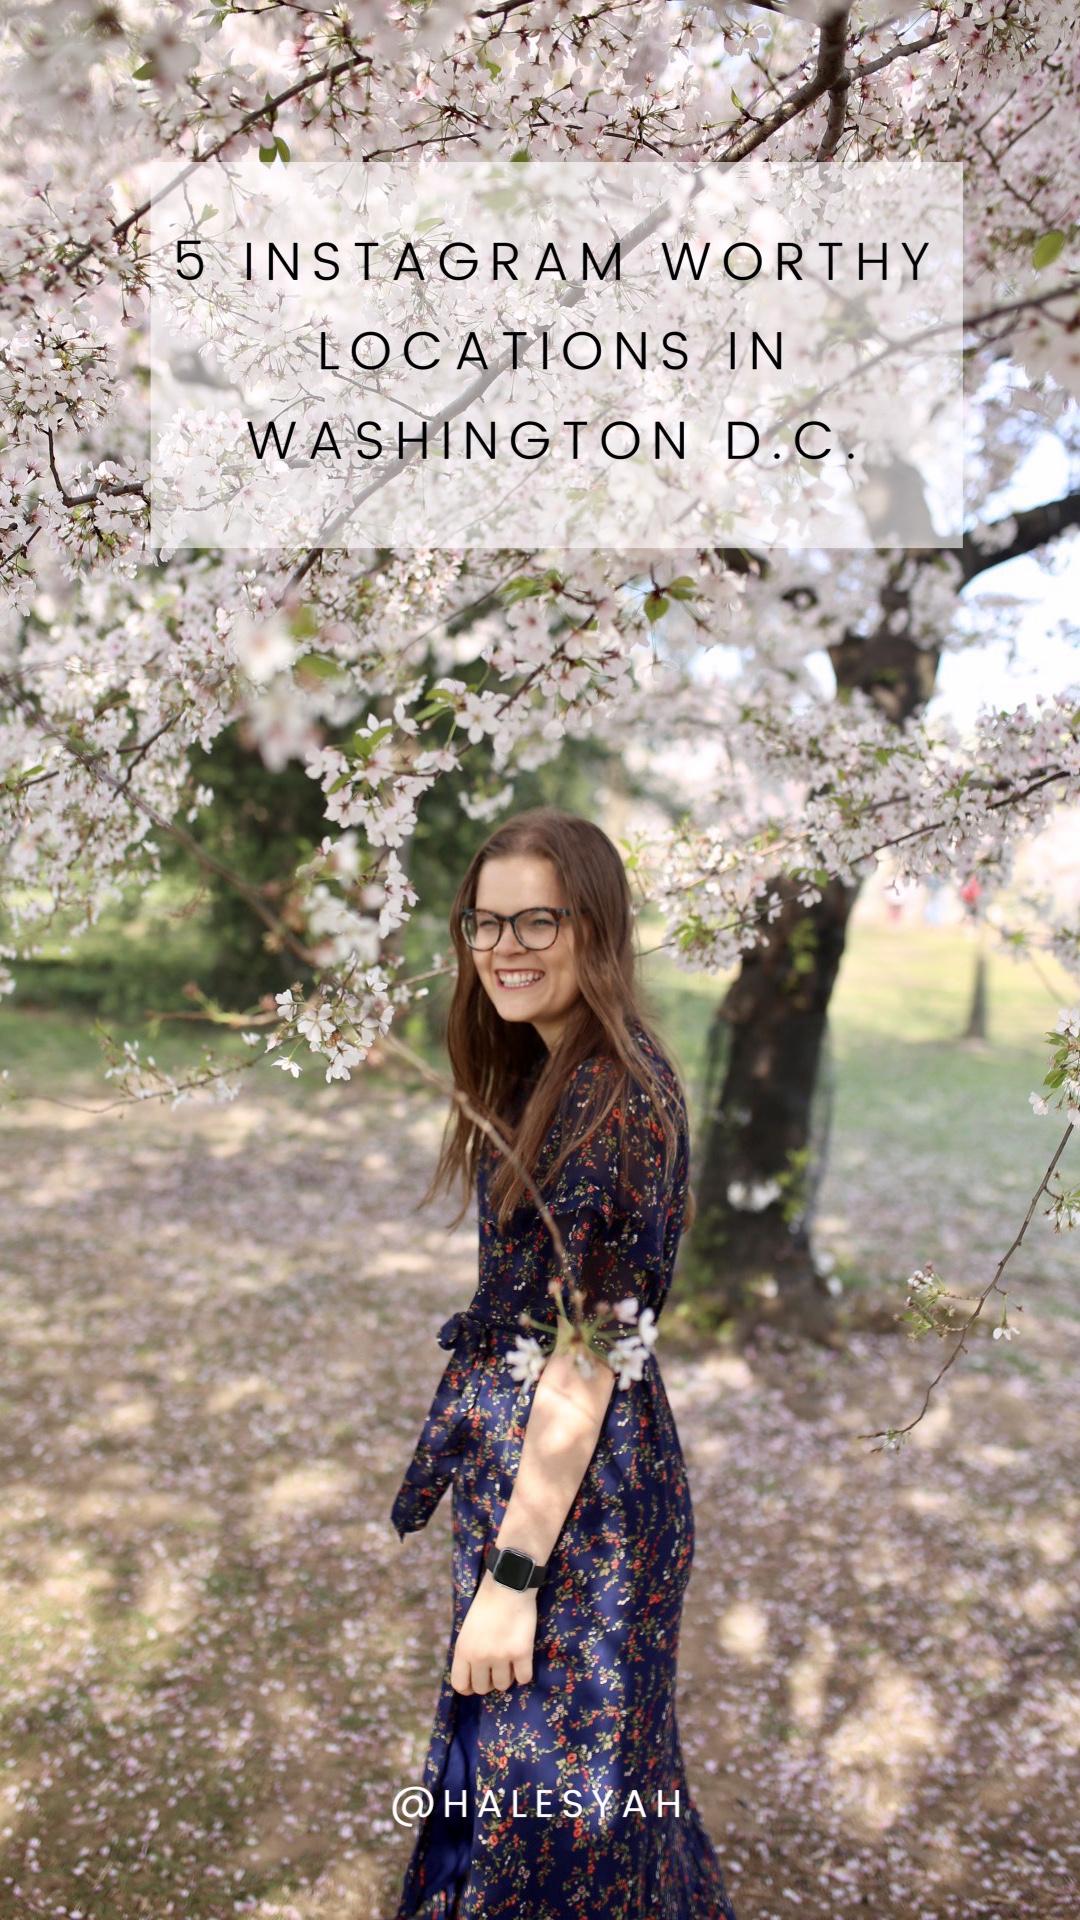 5 Instagram Worthy Locations in Washington D.C.